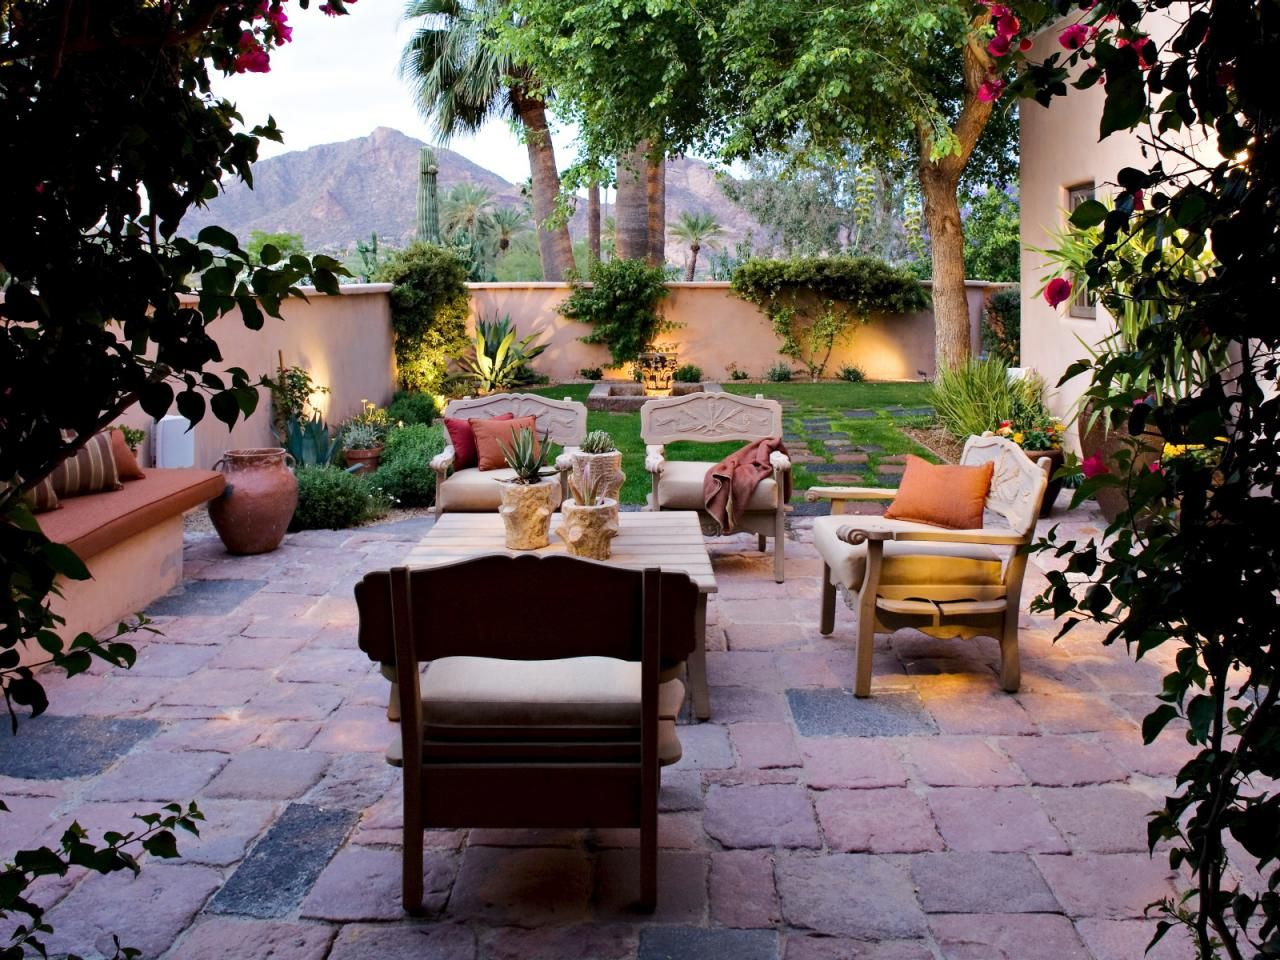 Stucco Walls Lend Privacy To This Arizona Backyard Rustic